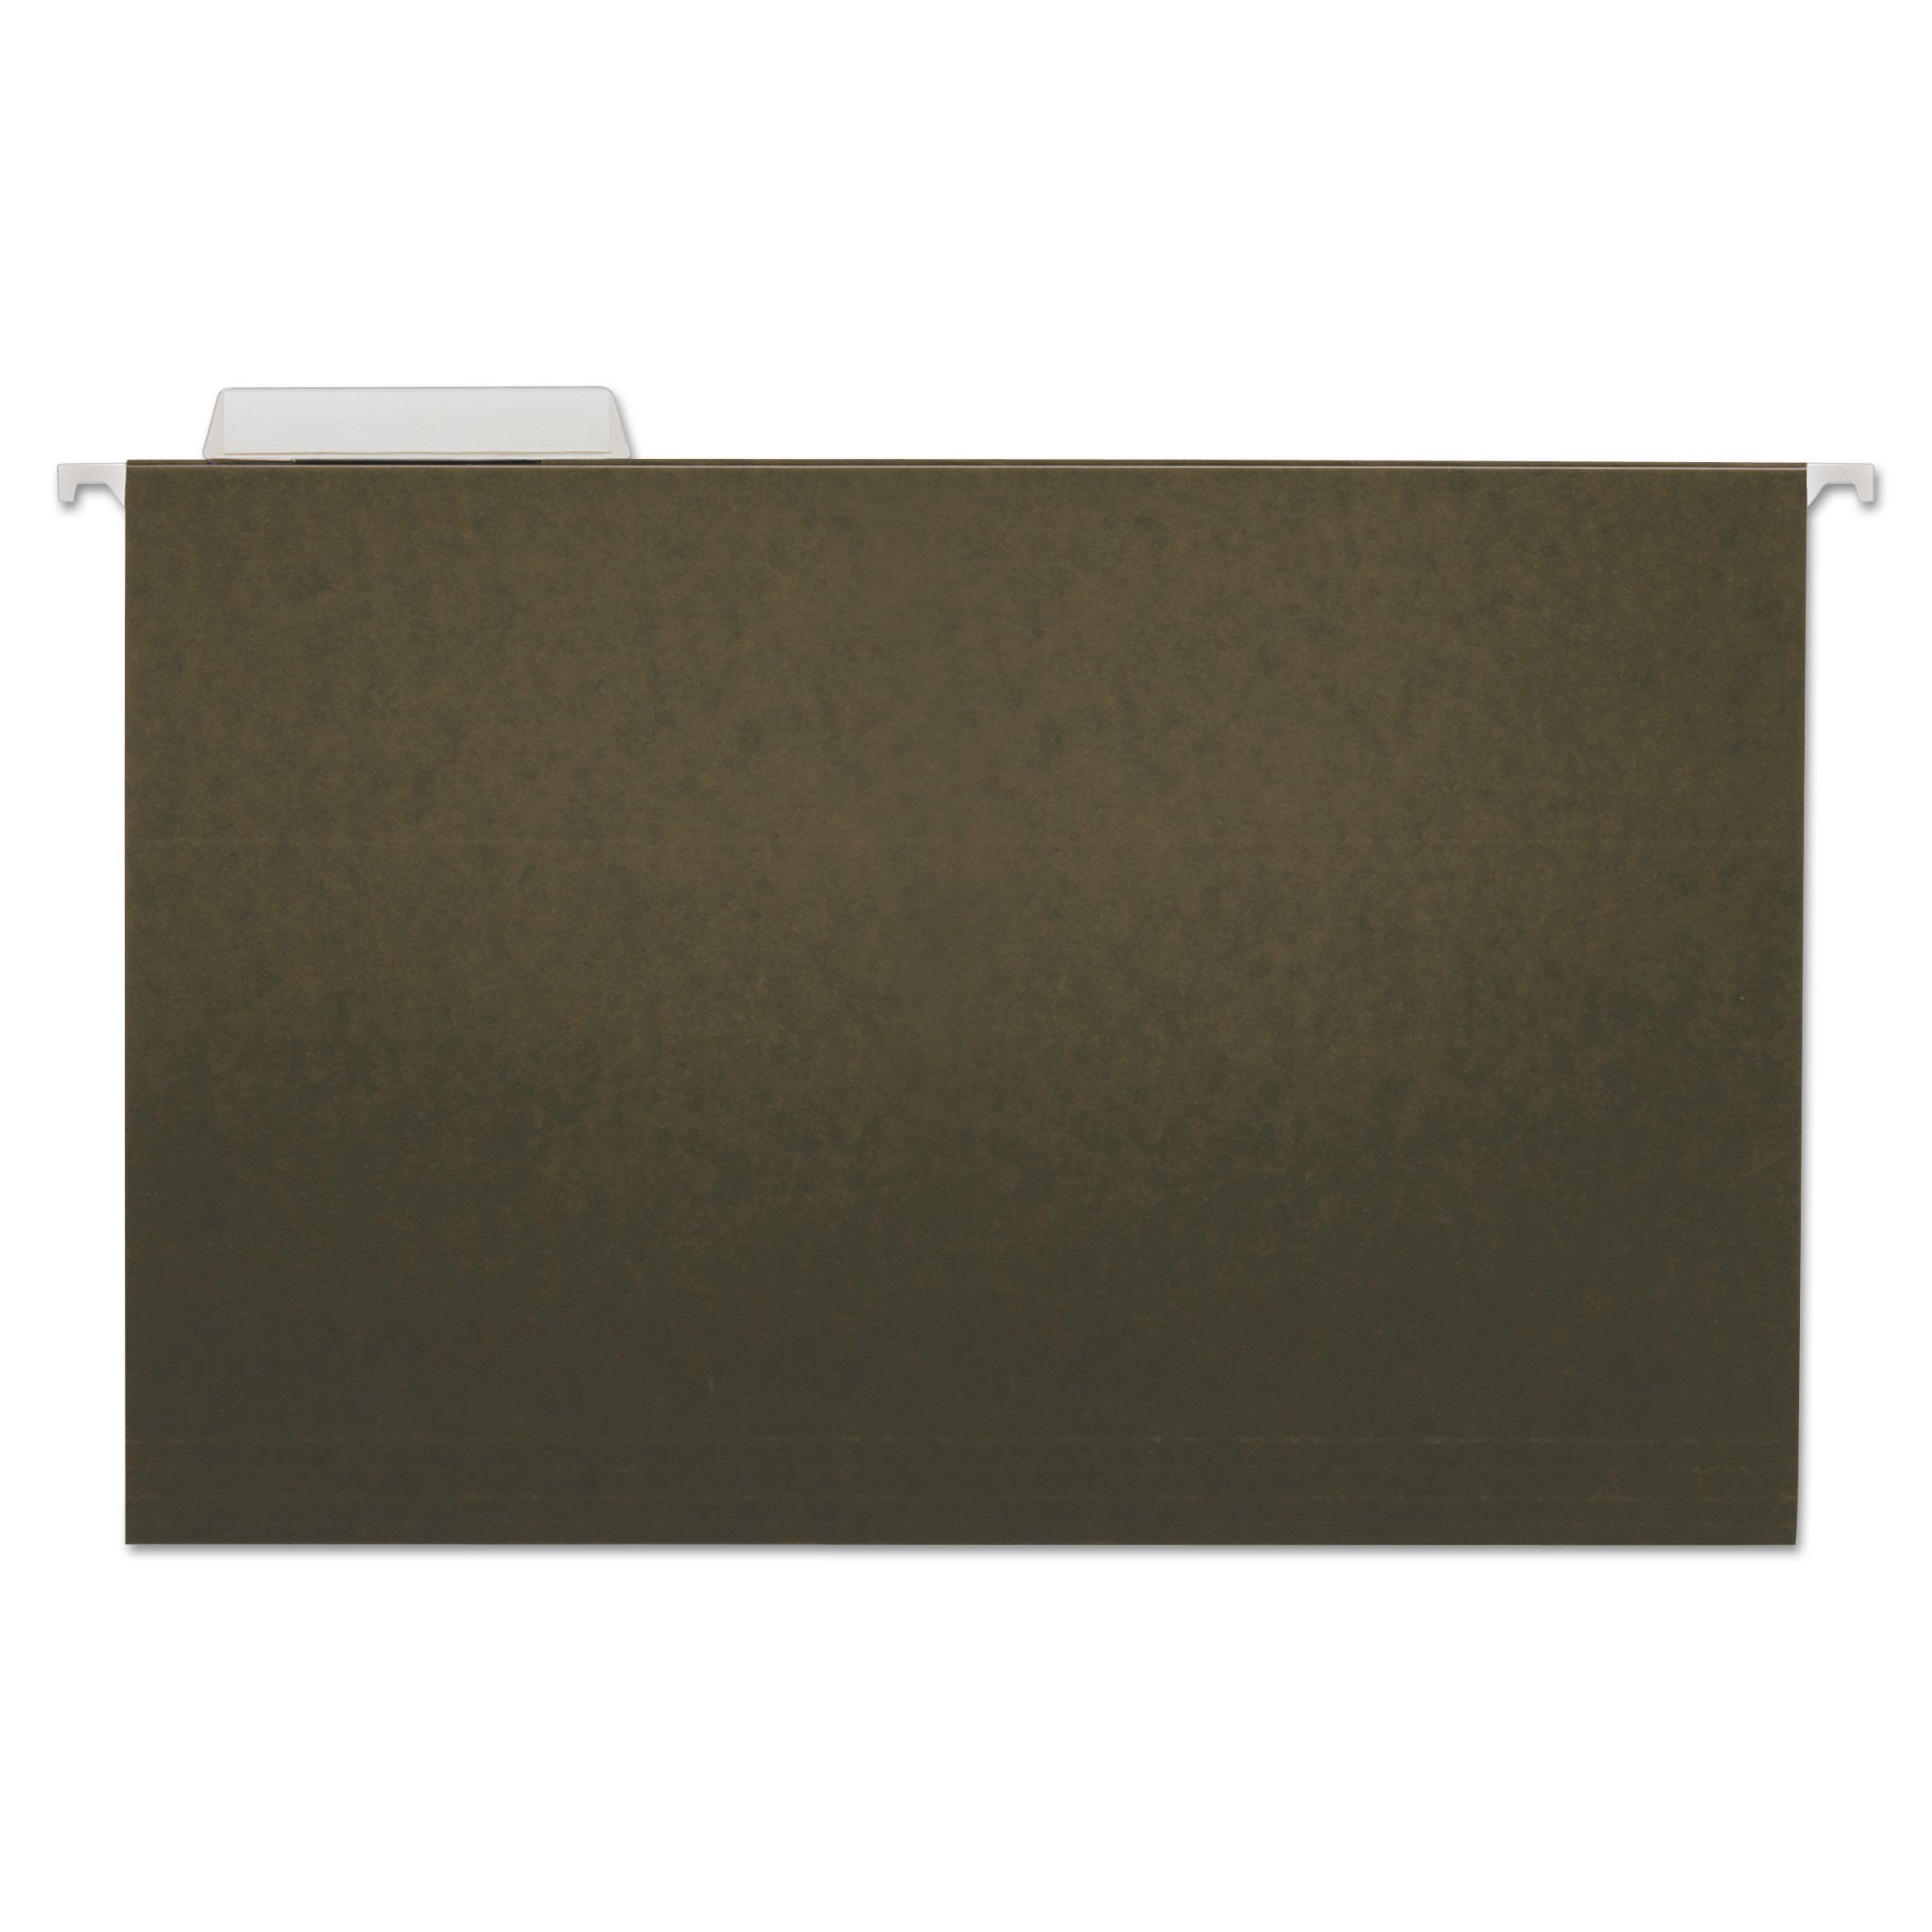 Hanging File Folders, Legal Size, 1/3-Cut Tab, Standard Green, 25/Box